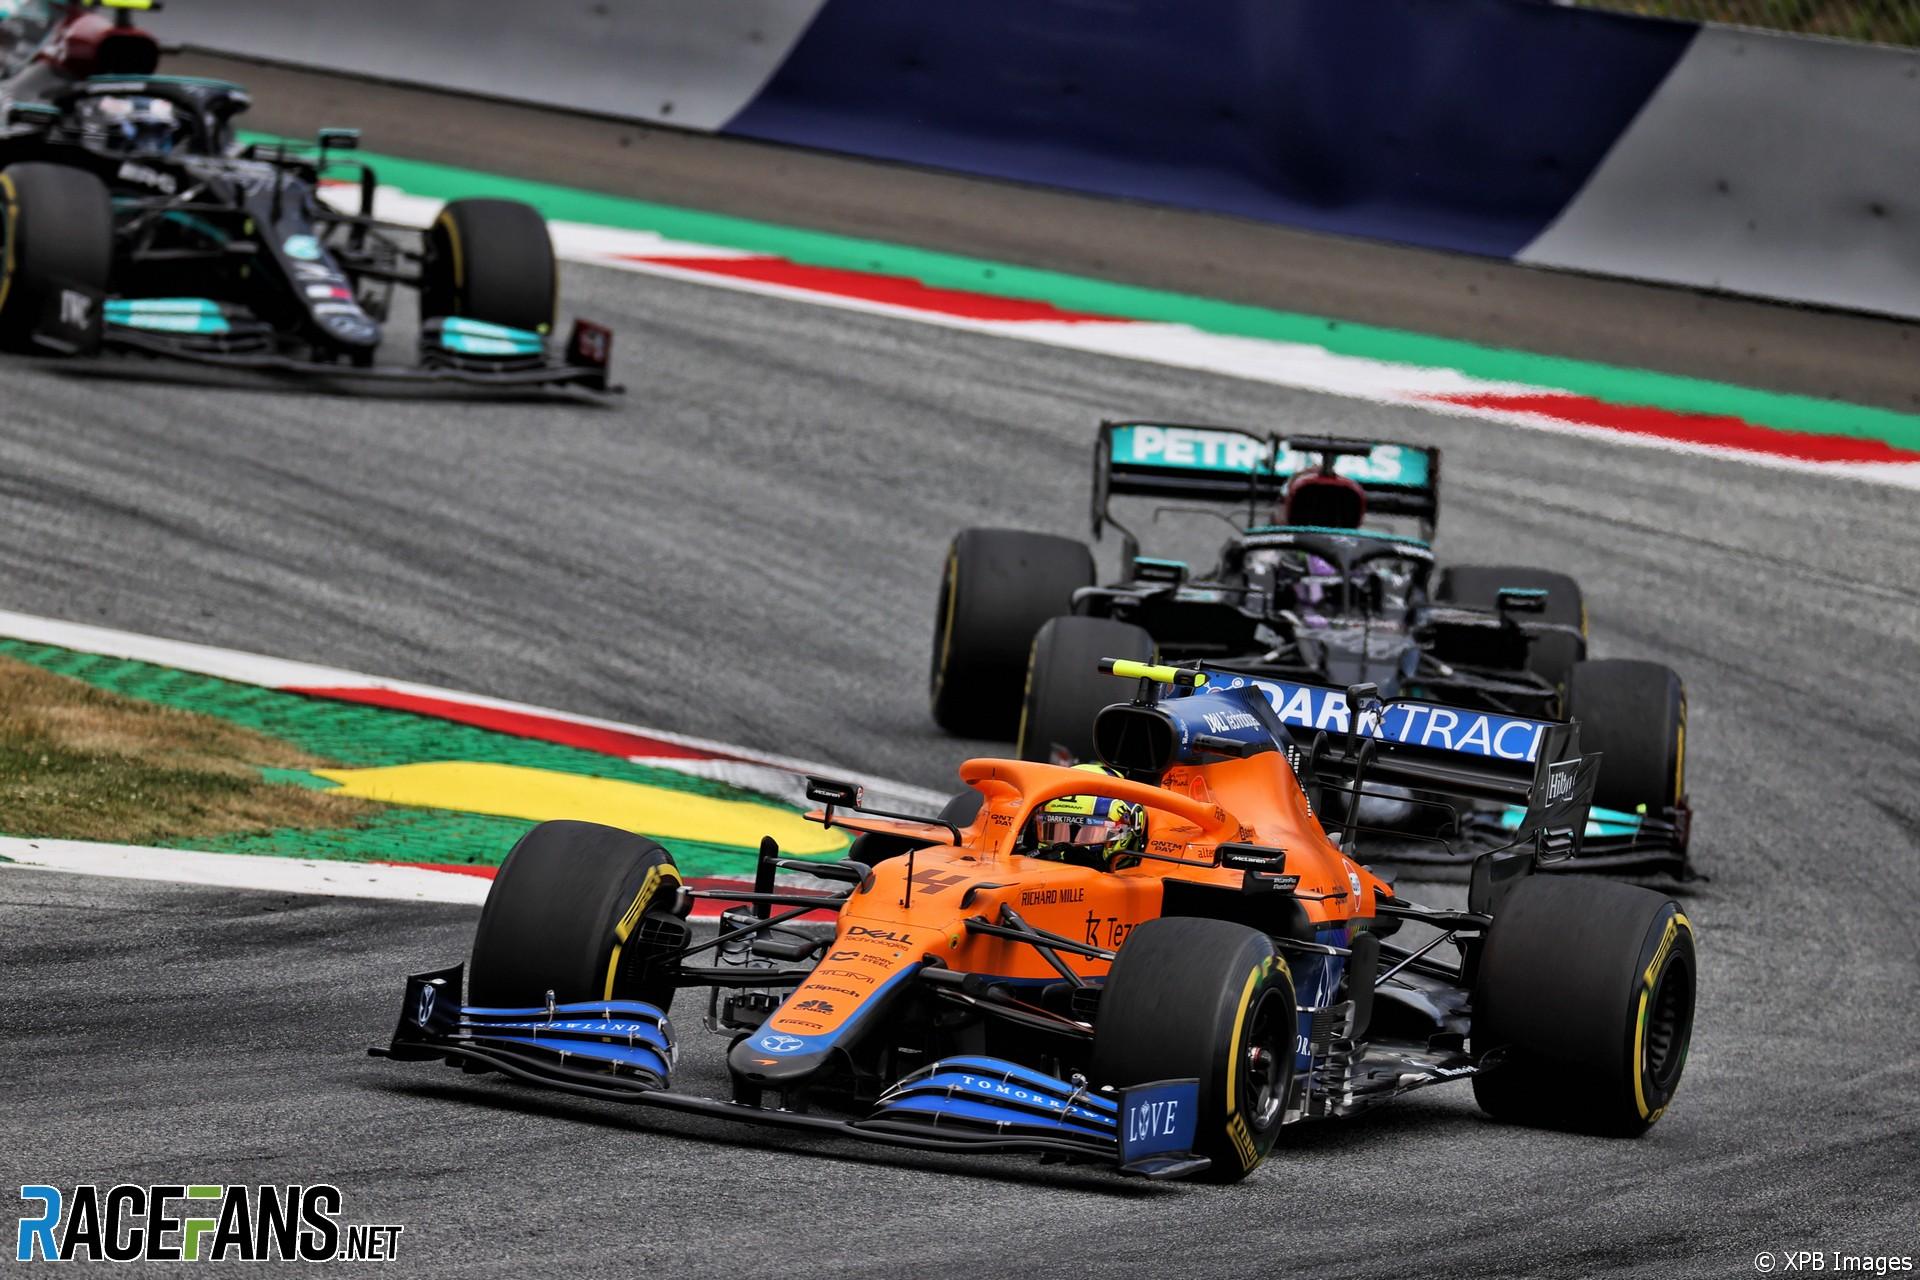 Lando Norris, McLaren, Red Bull Ring, 2021